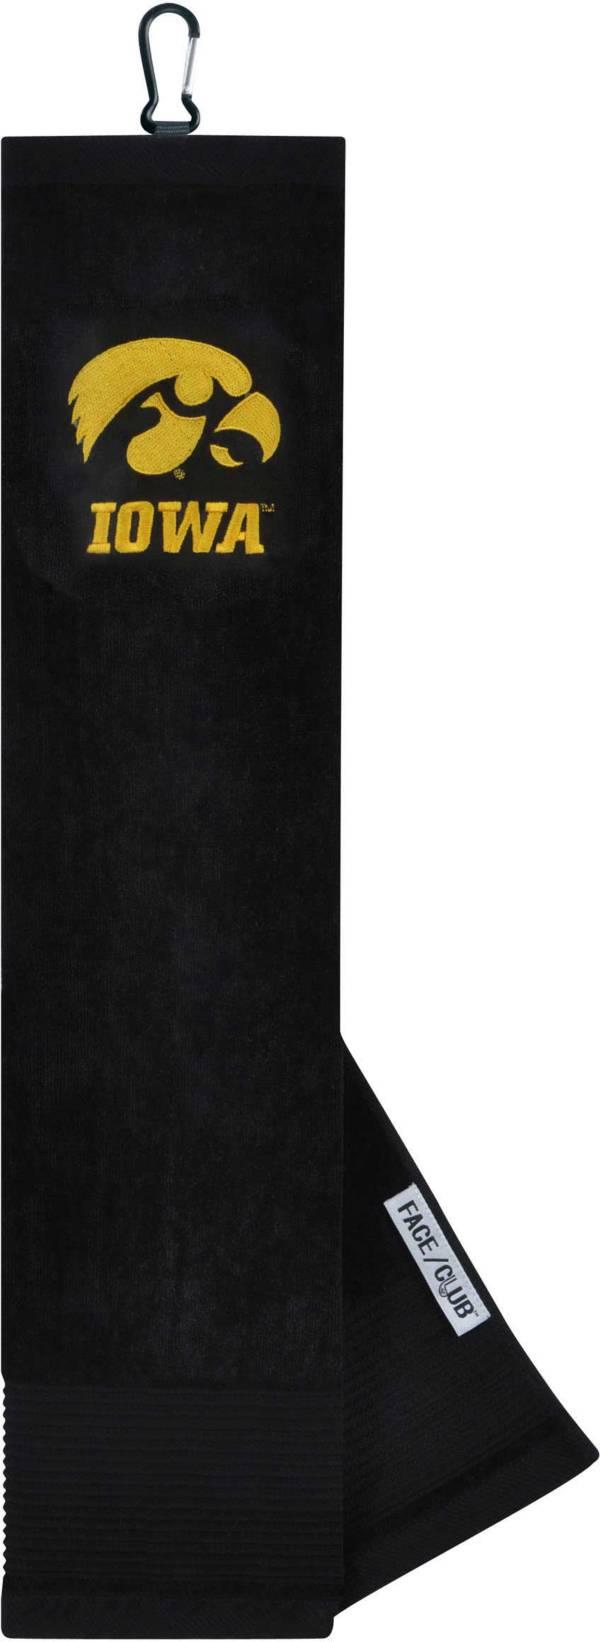 Team Effort Iowa Hawkeyes Embroidered Face/Club Tri-Fold Towel product image